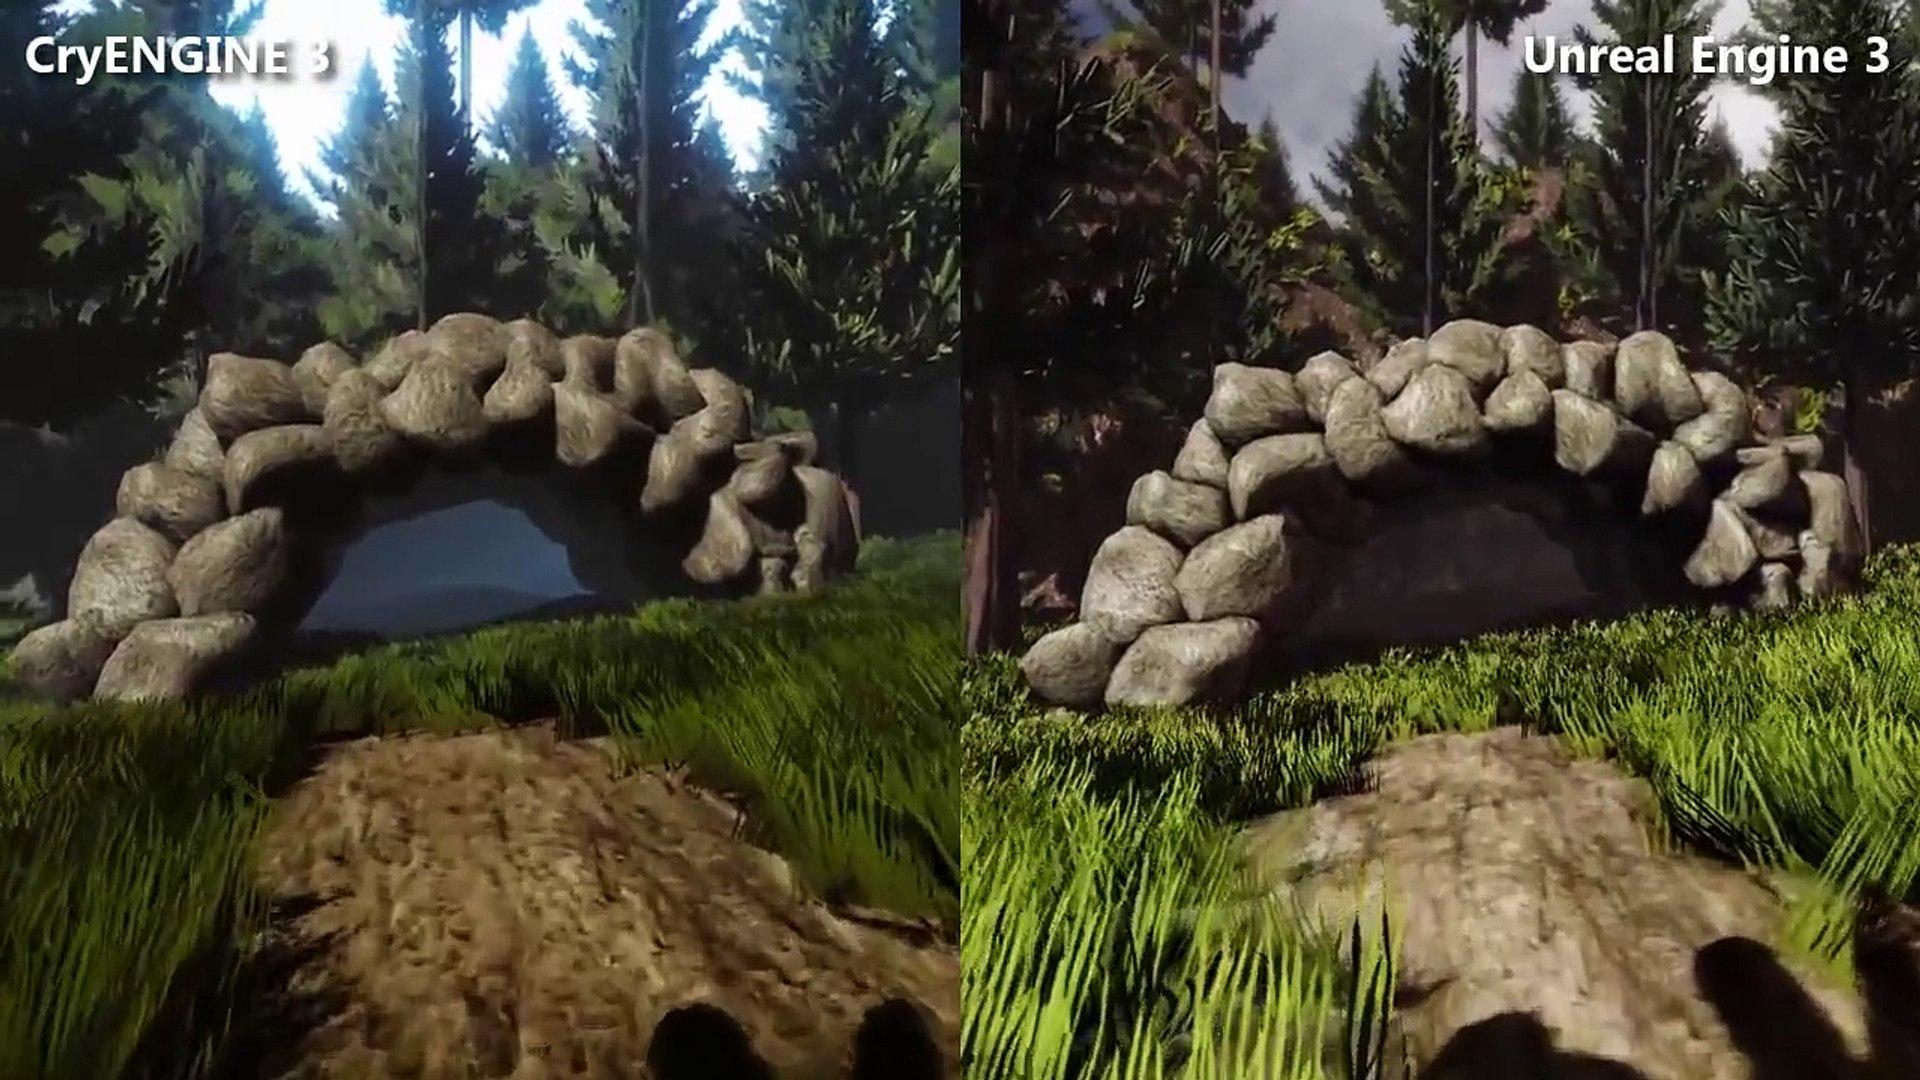 [Comparison] CryENGINE 3 vs  Unreal Engine 3